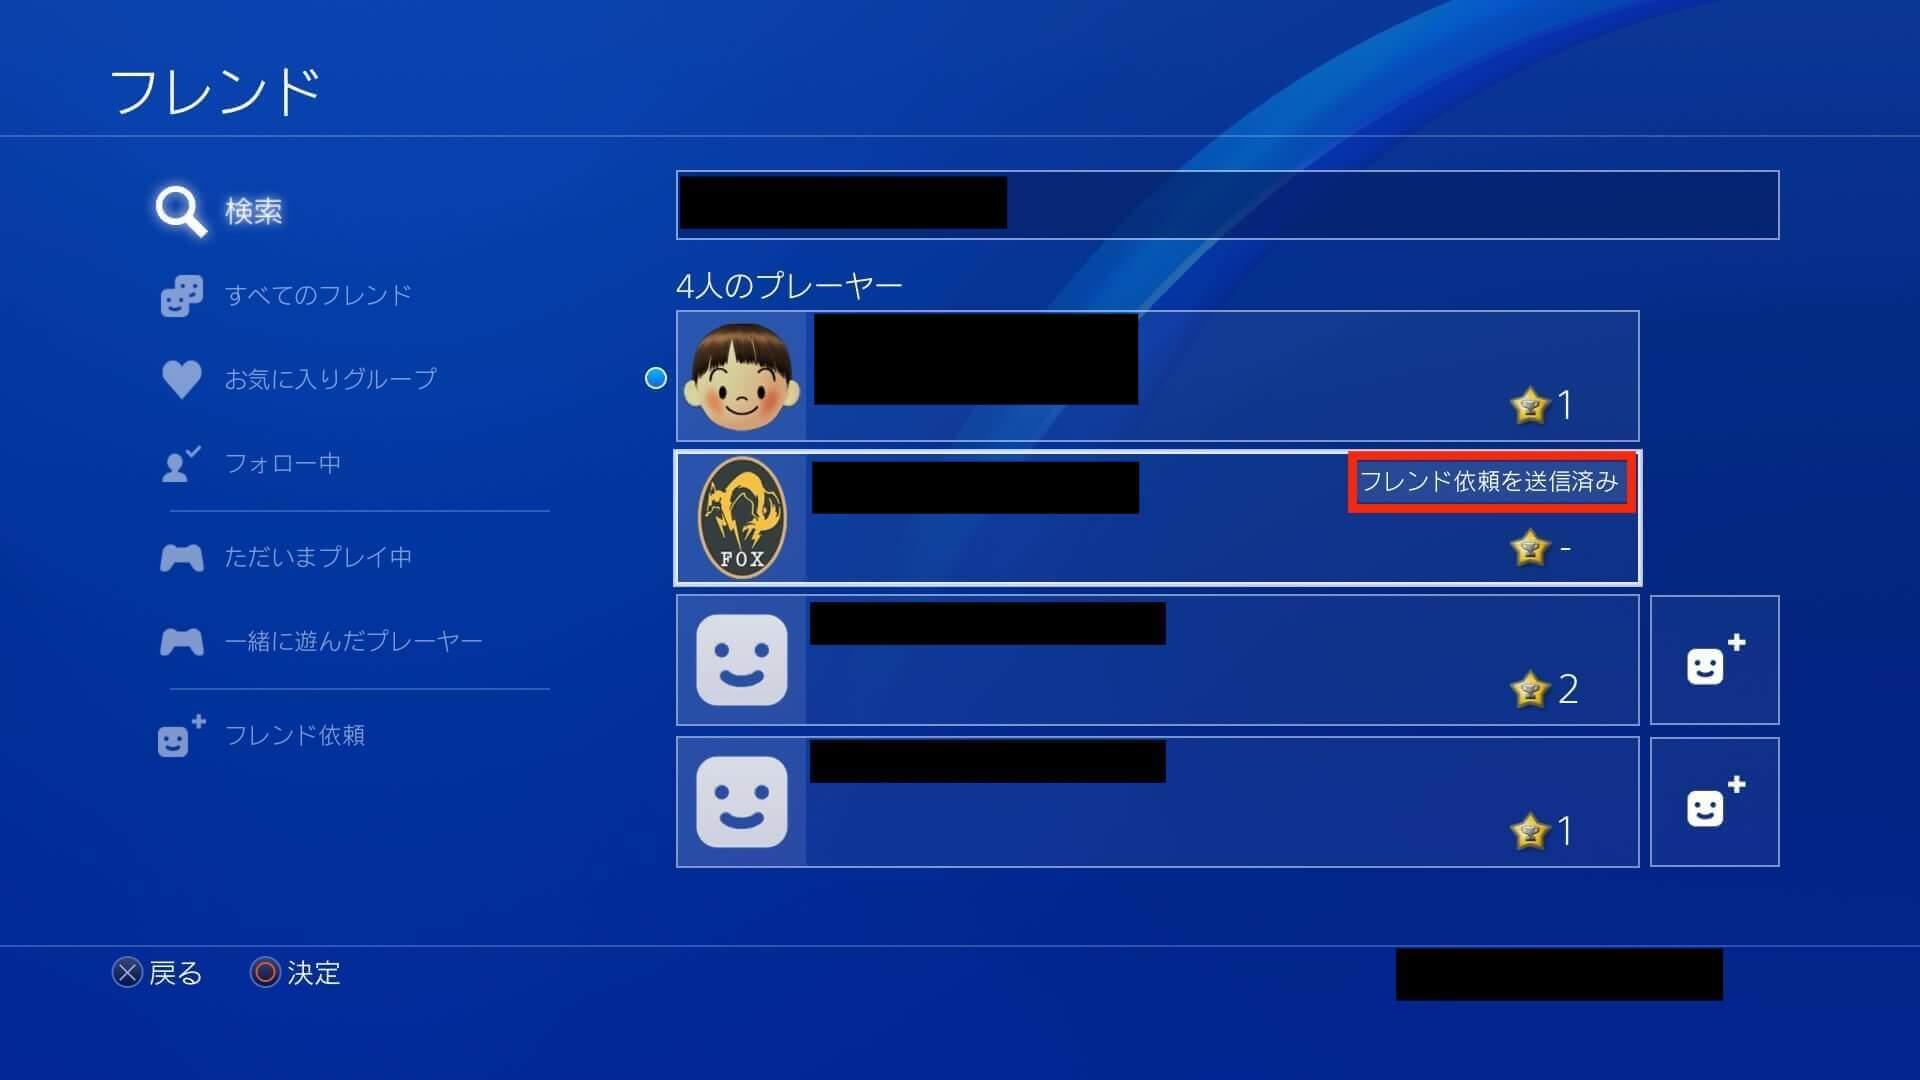 PS4フレンド申請